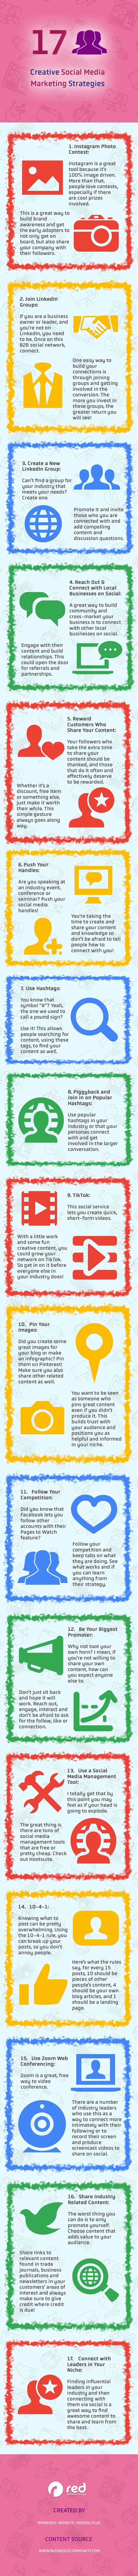 17 social media ideas listing